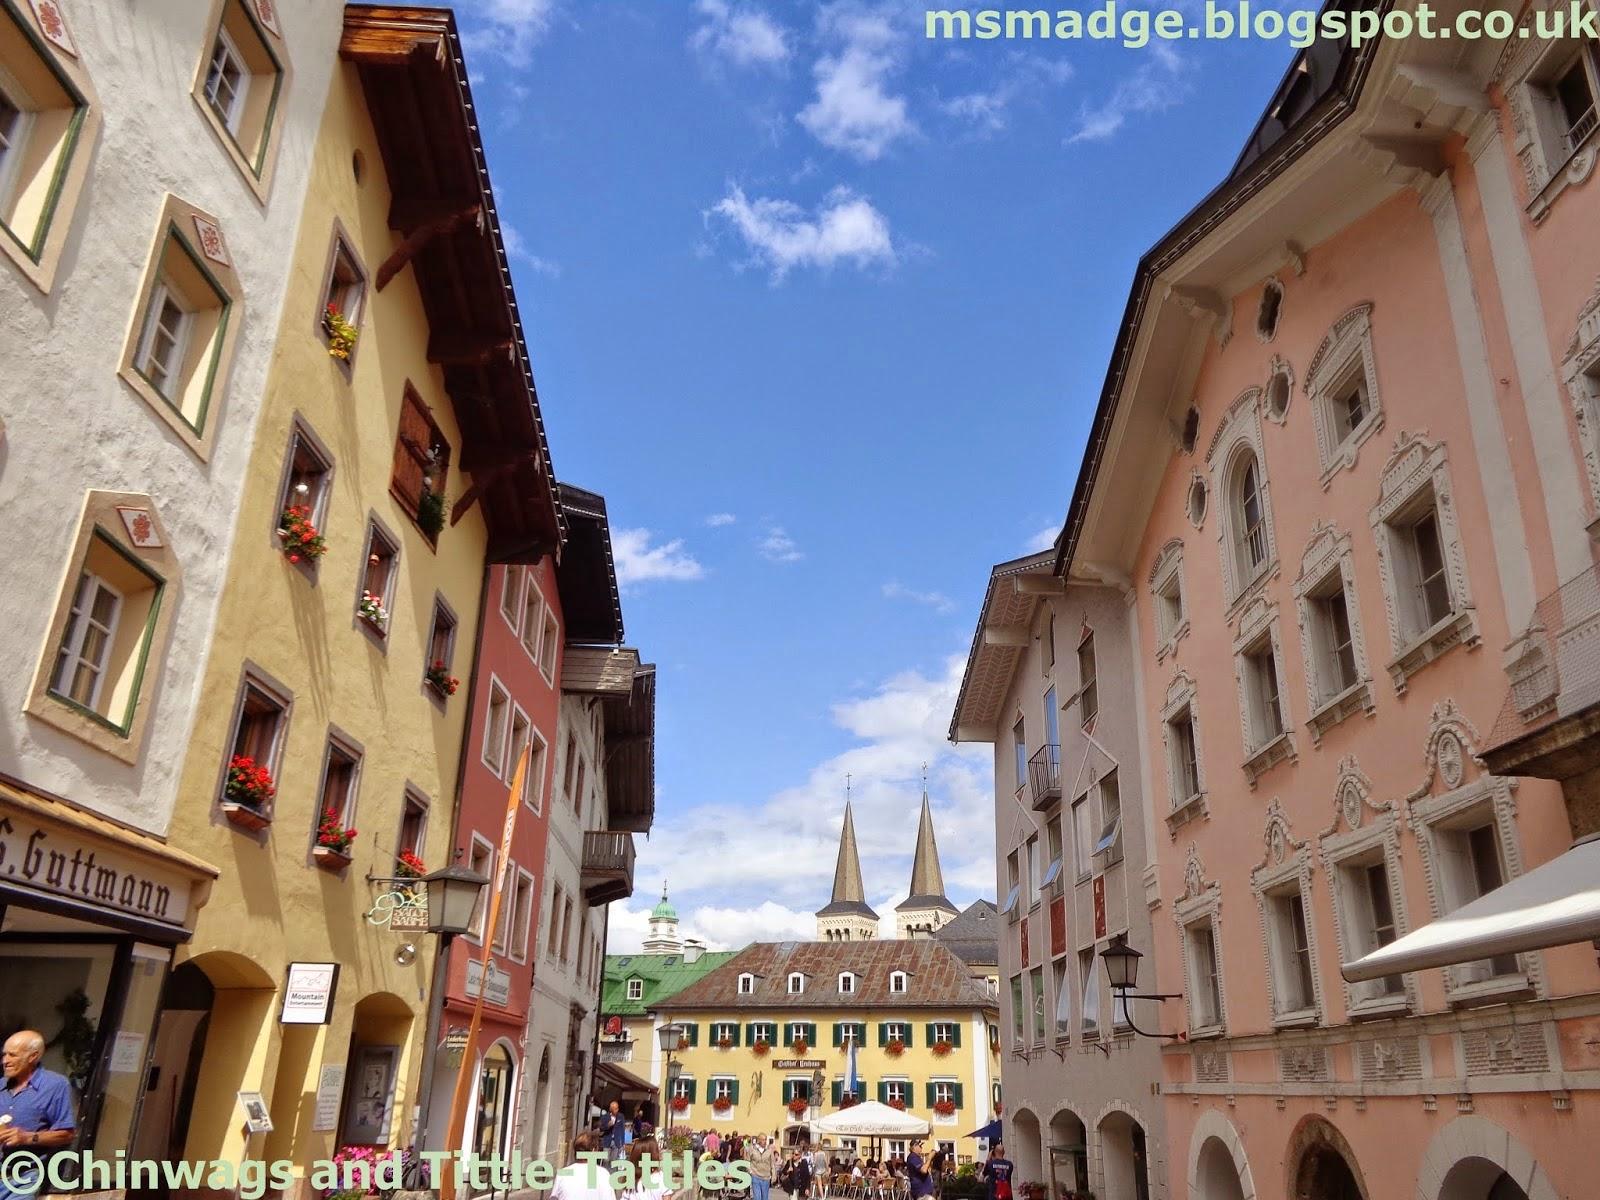 http://msmadge.blogspot.co.uk/2014/10/berchtesgaden-quick-stop-in-bavarian.html